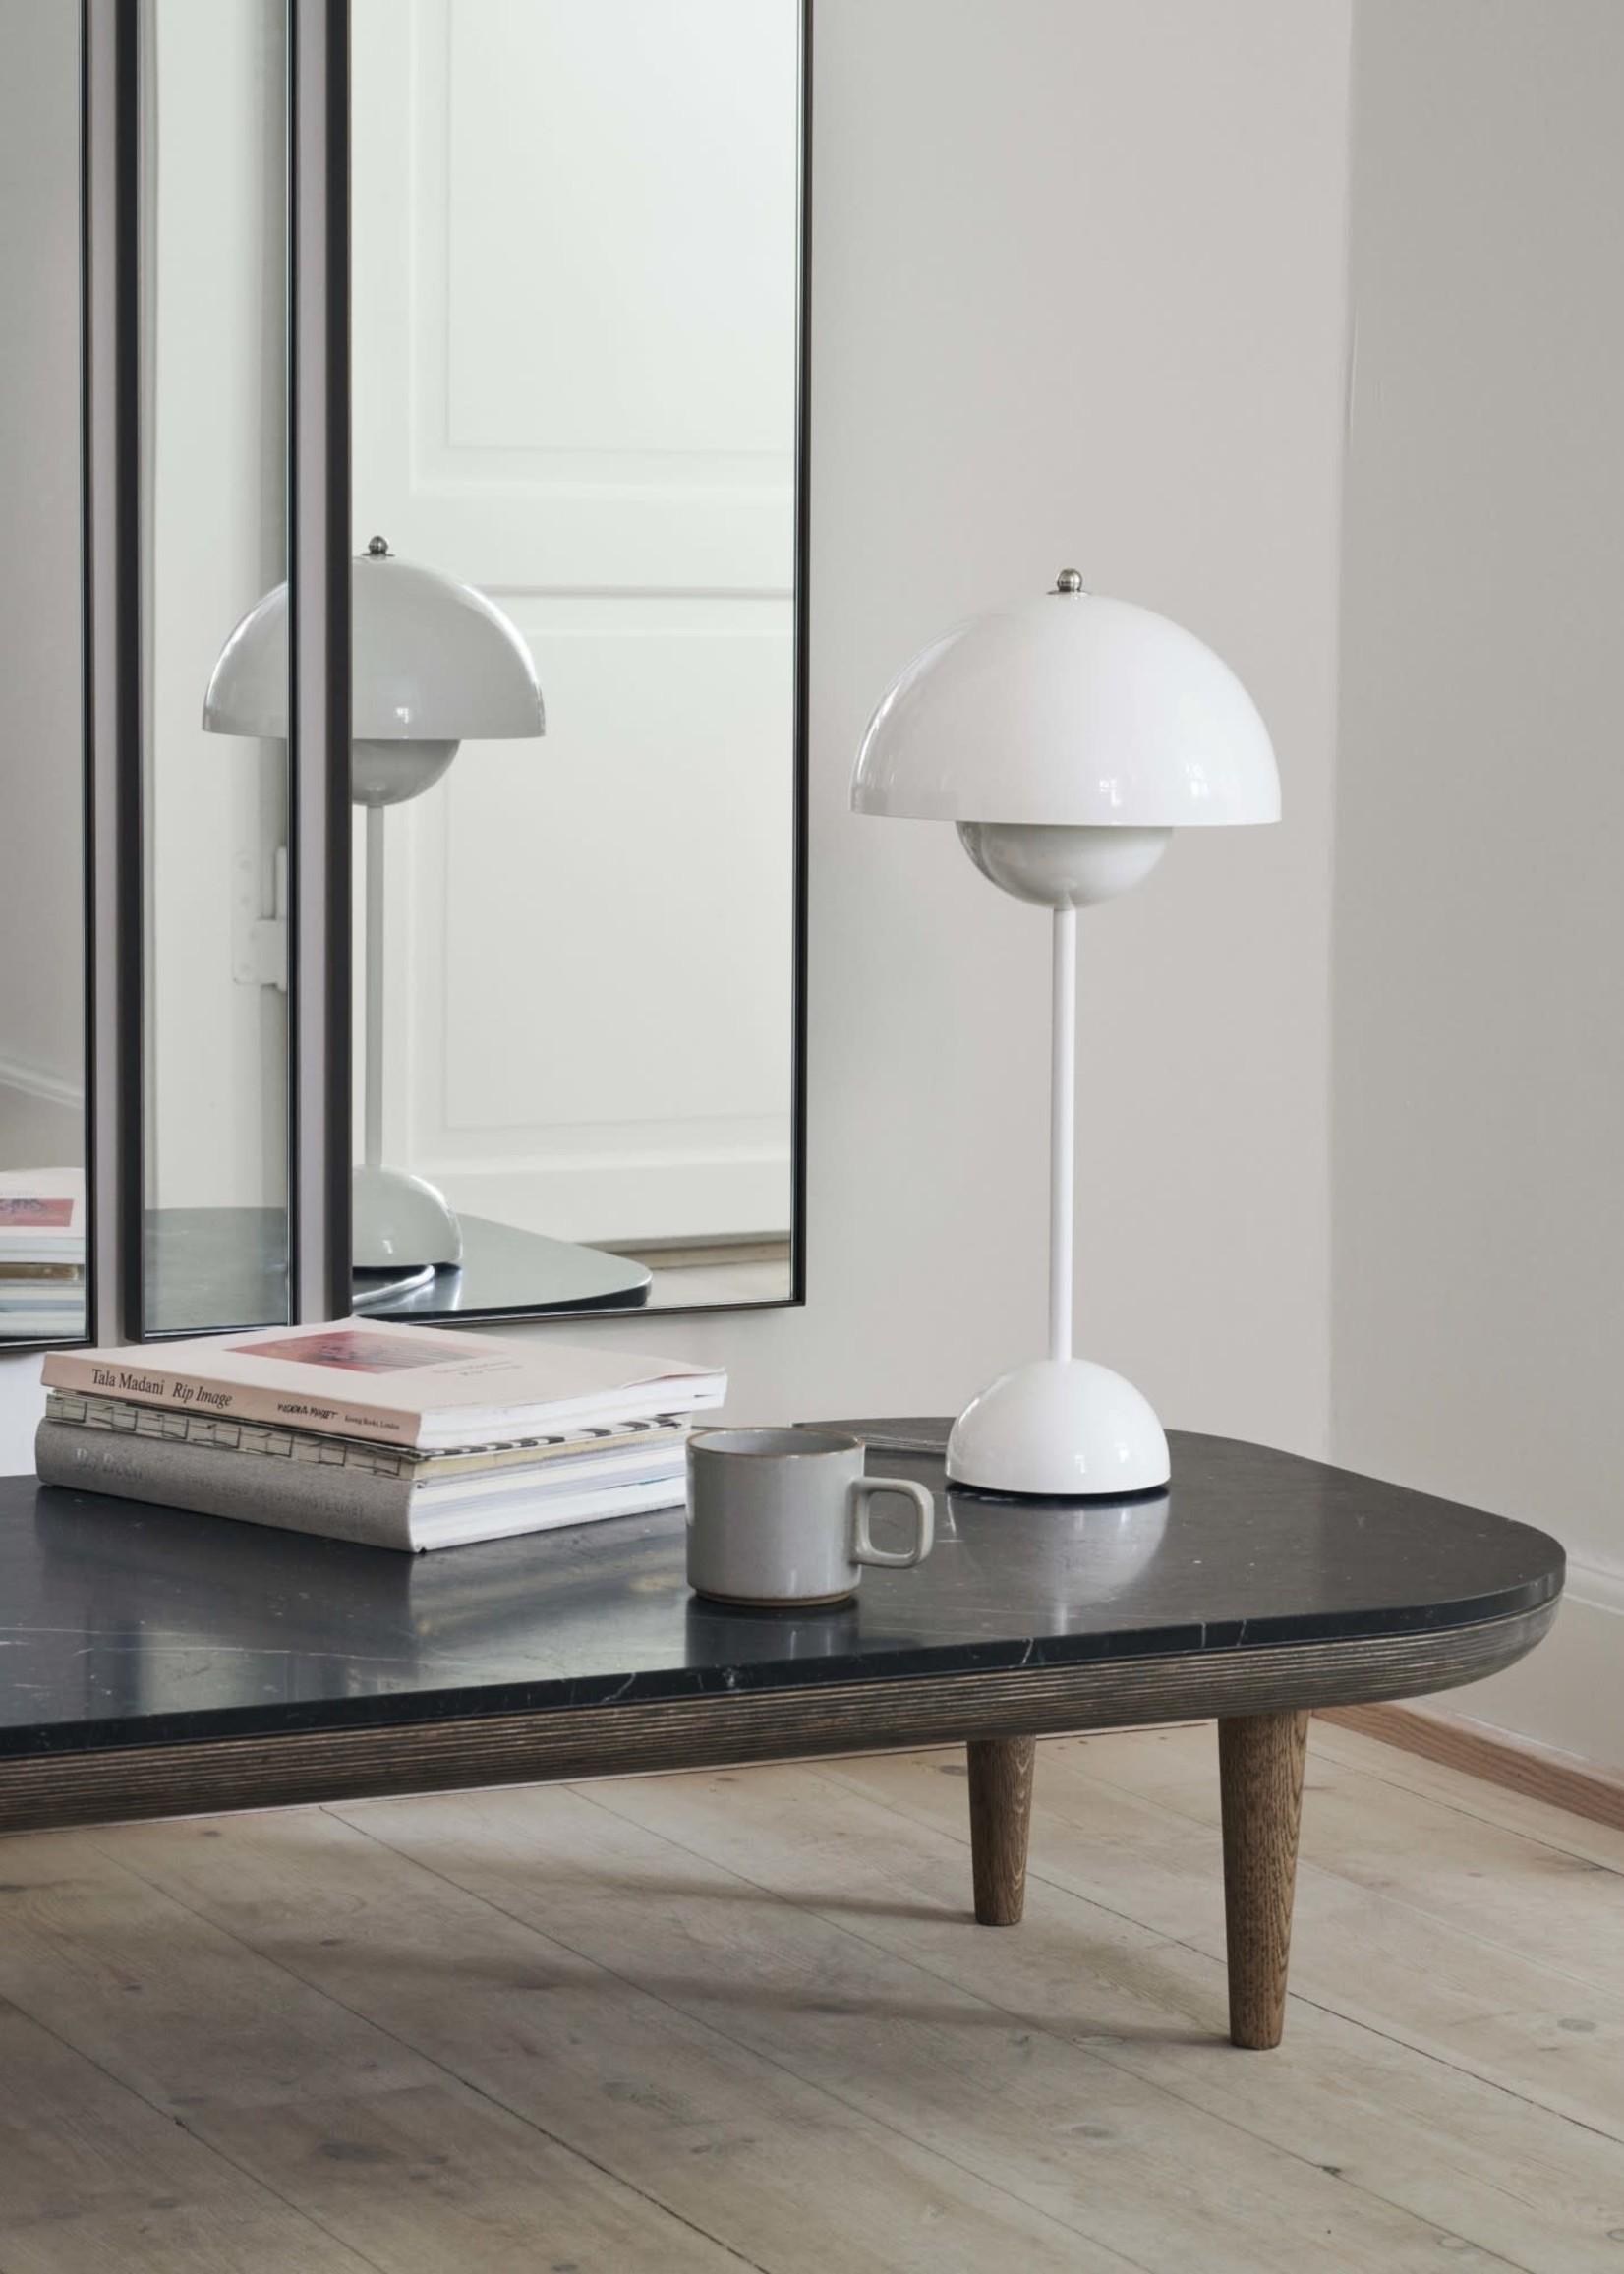 & Tradition Verner Panton Flower Pot Table Lamp in White